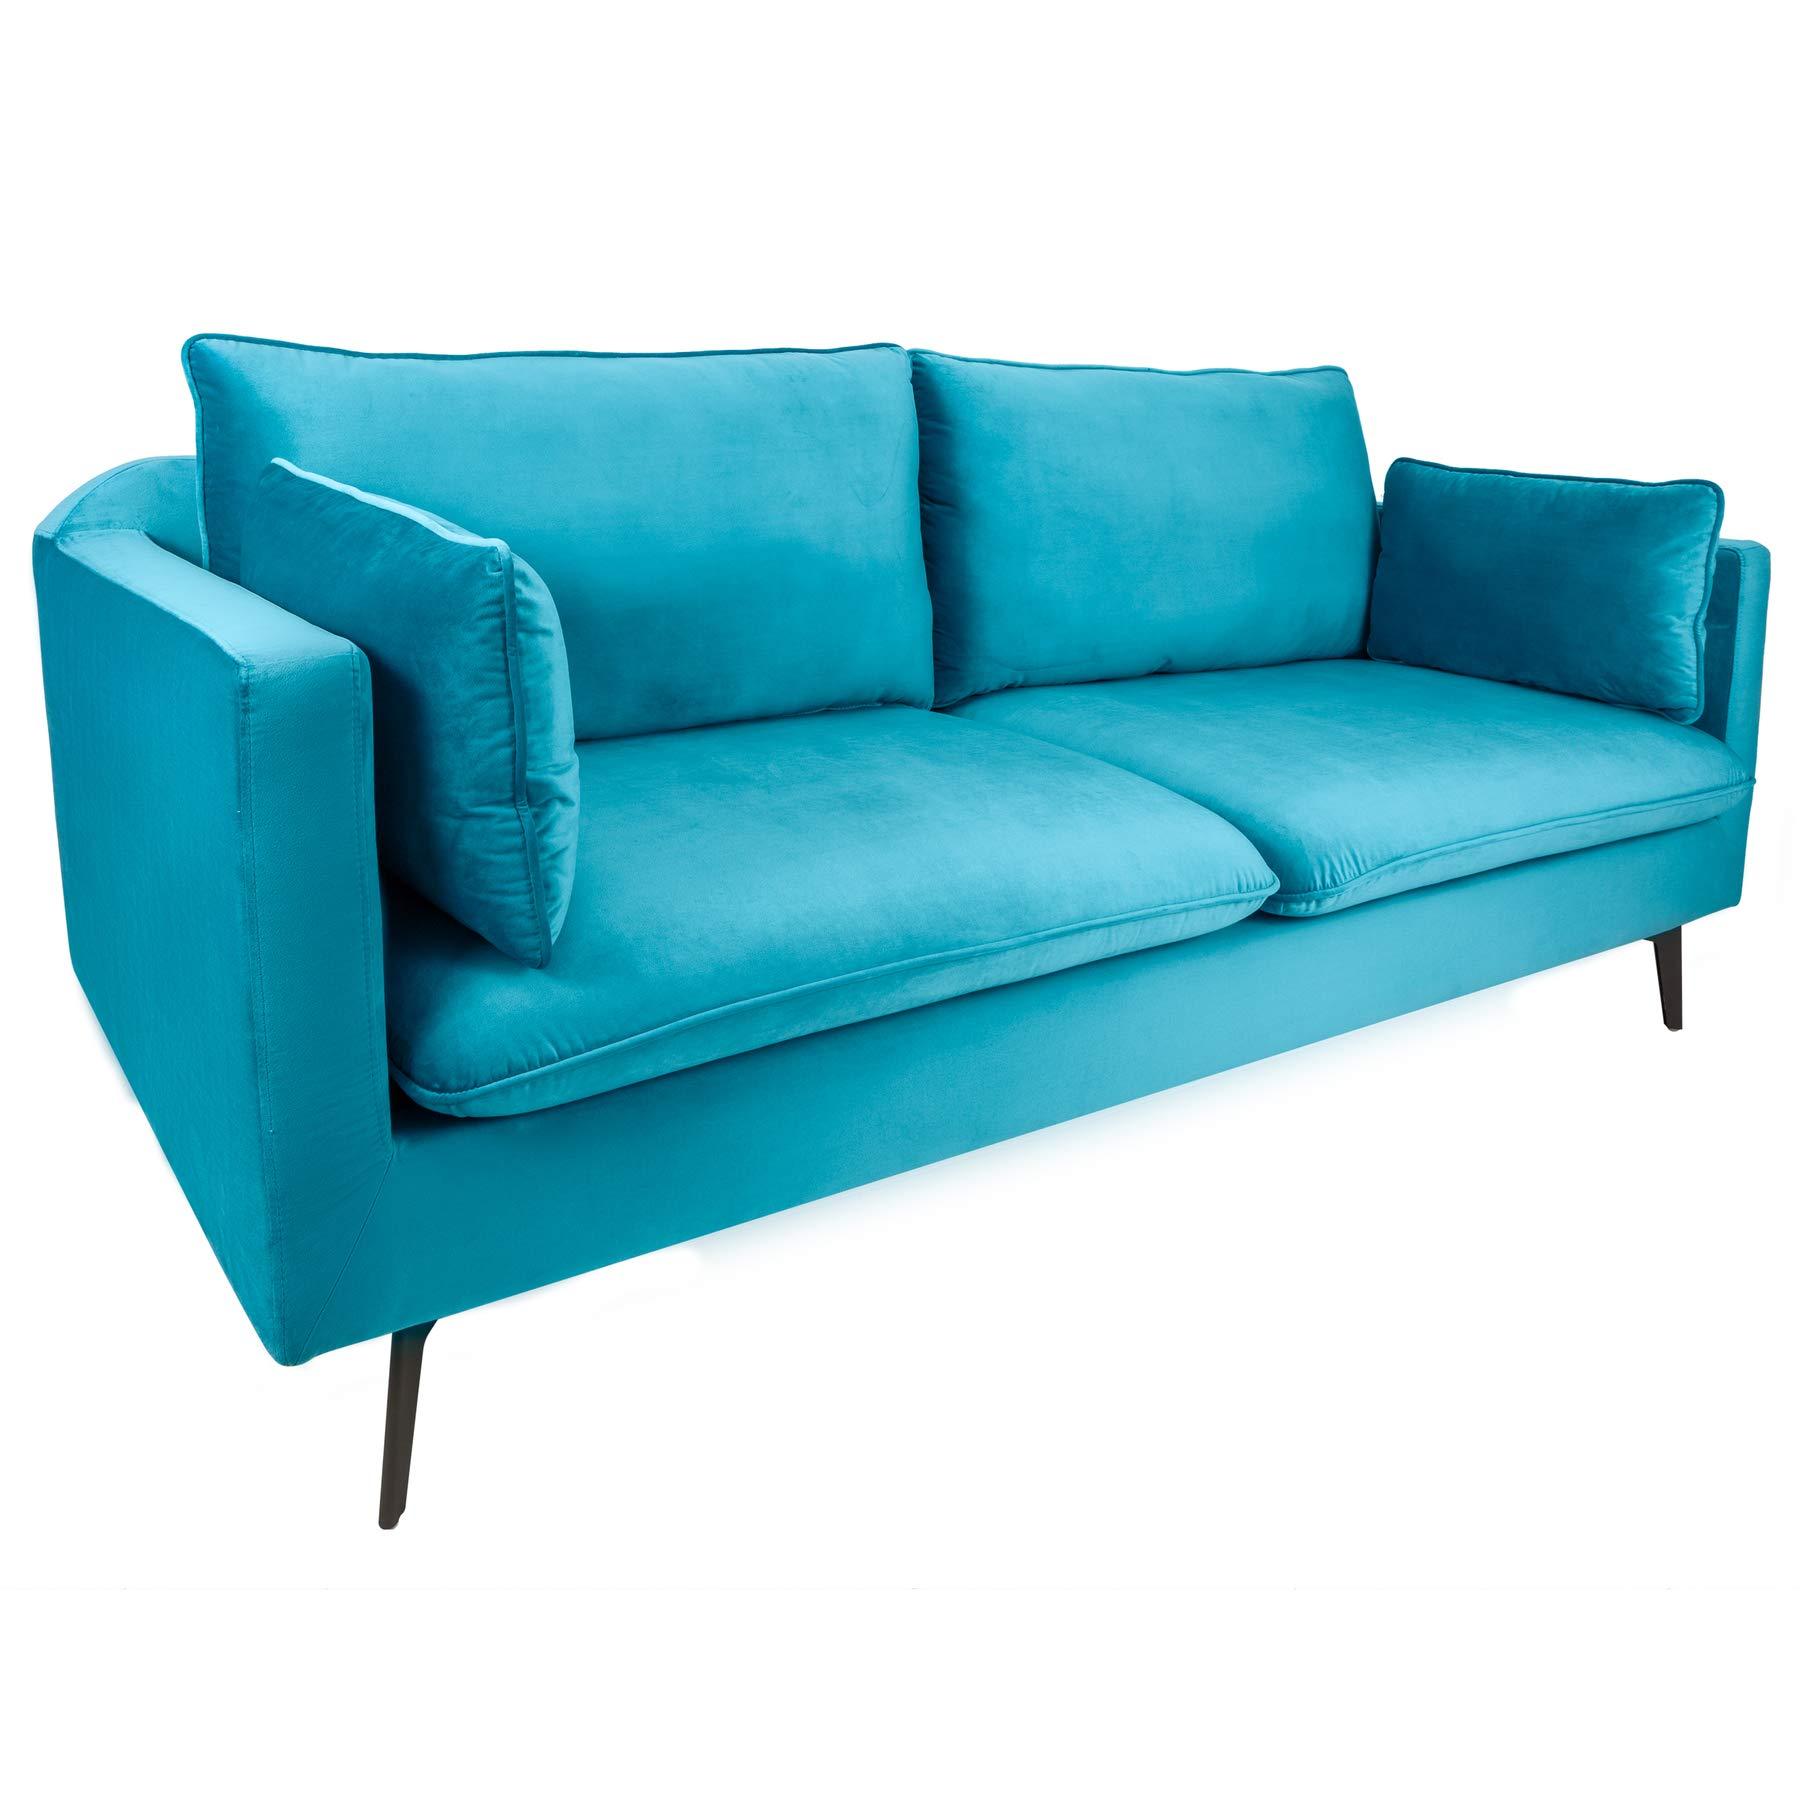 Full Size of Riess Ambiente Design 3er Sofa Famous Aqua Blau 210cm Samt Spannbezug Tom Tailor Flexform Landhausstil U Form Weißes Hersteller Verkaufen Weiß Grau Led Erpo Sofa Sofa Samt